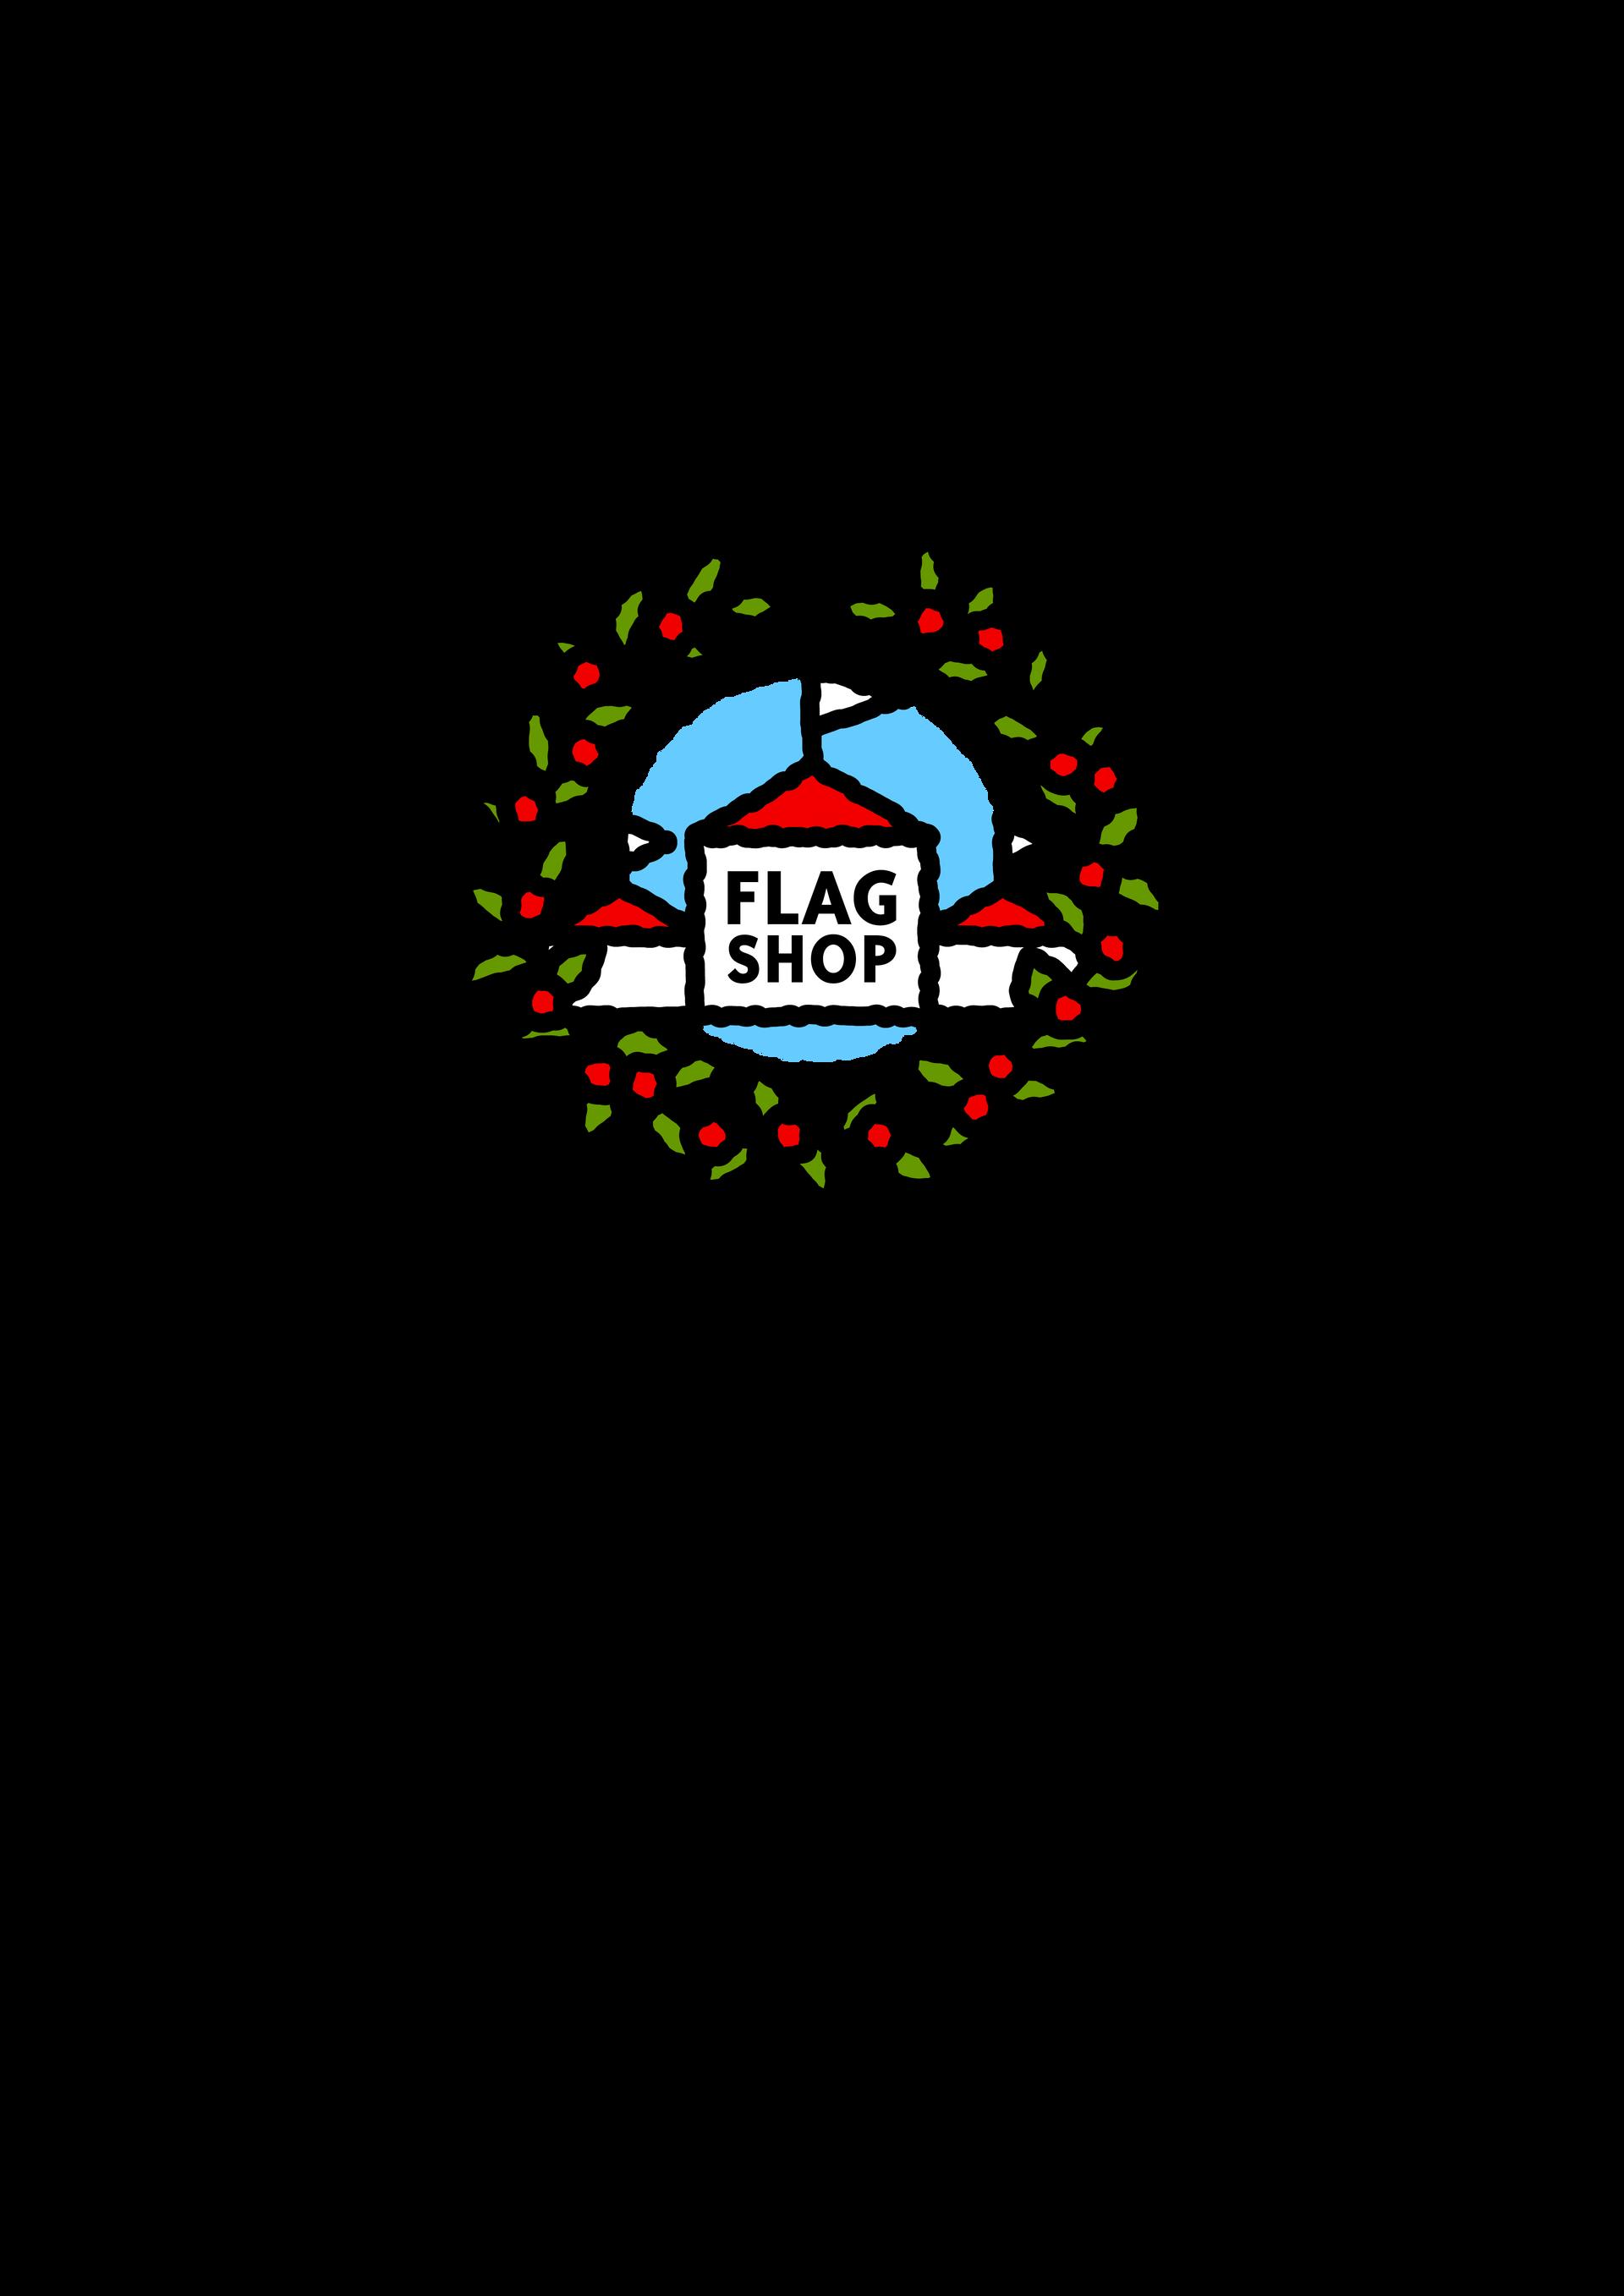 flagshop-DATA-11.png